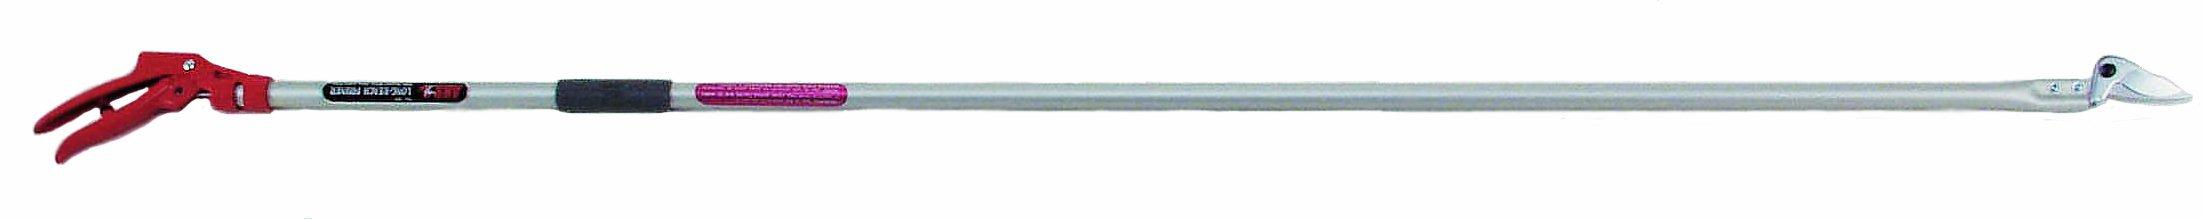 ARS LA-180R24 Long Reach Pruner, 8-Feet